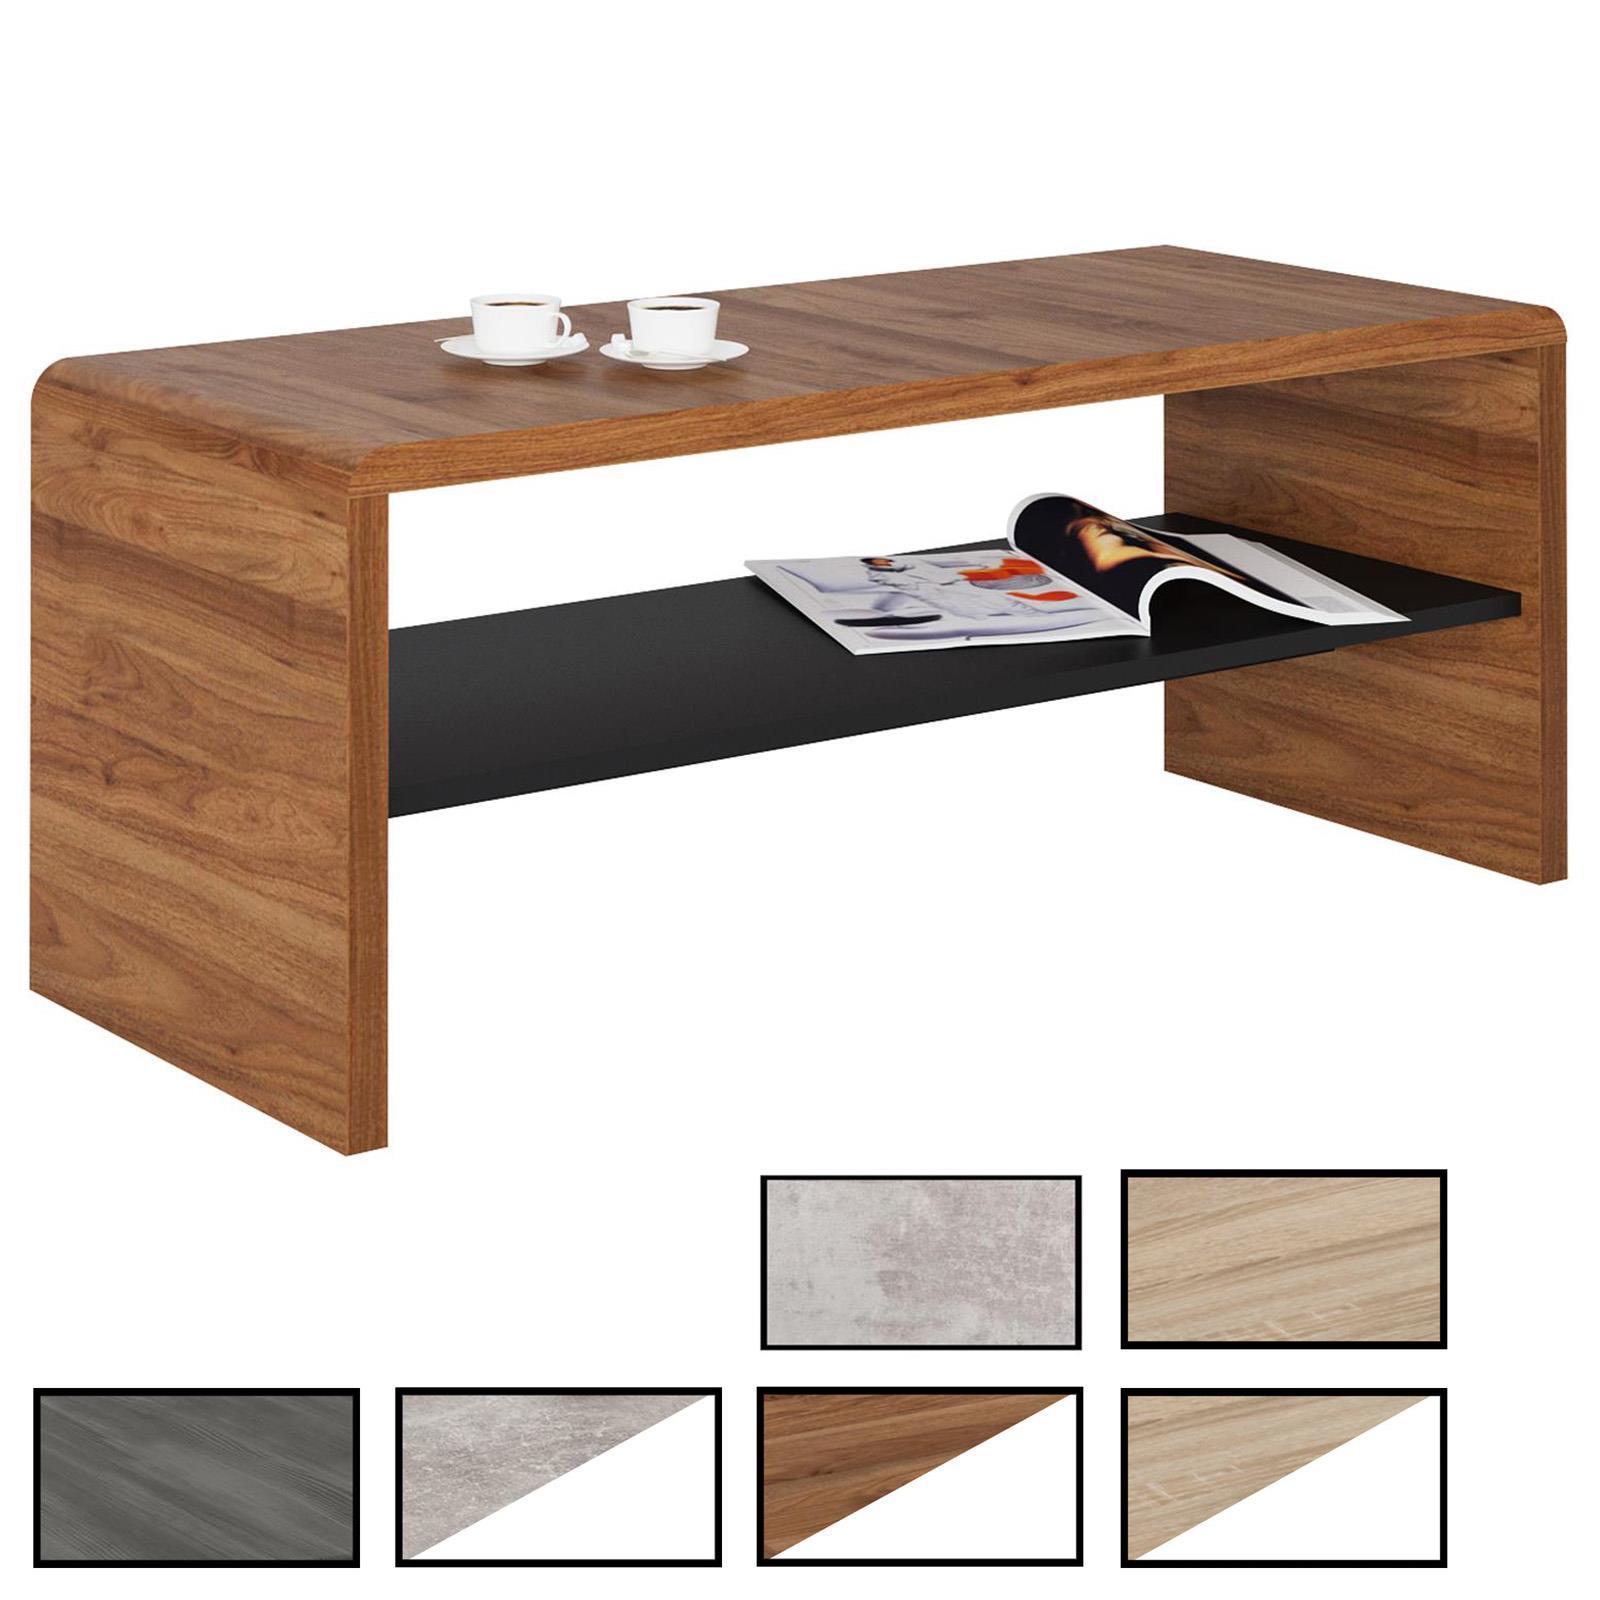 meuble tv table basse louna 6 coloris disponibles mobil meubles. Black Bedroom Furniture Sets. Home Design Ideas